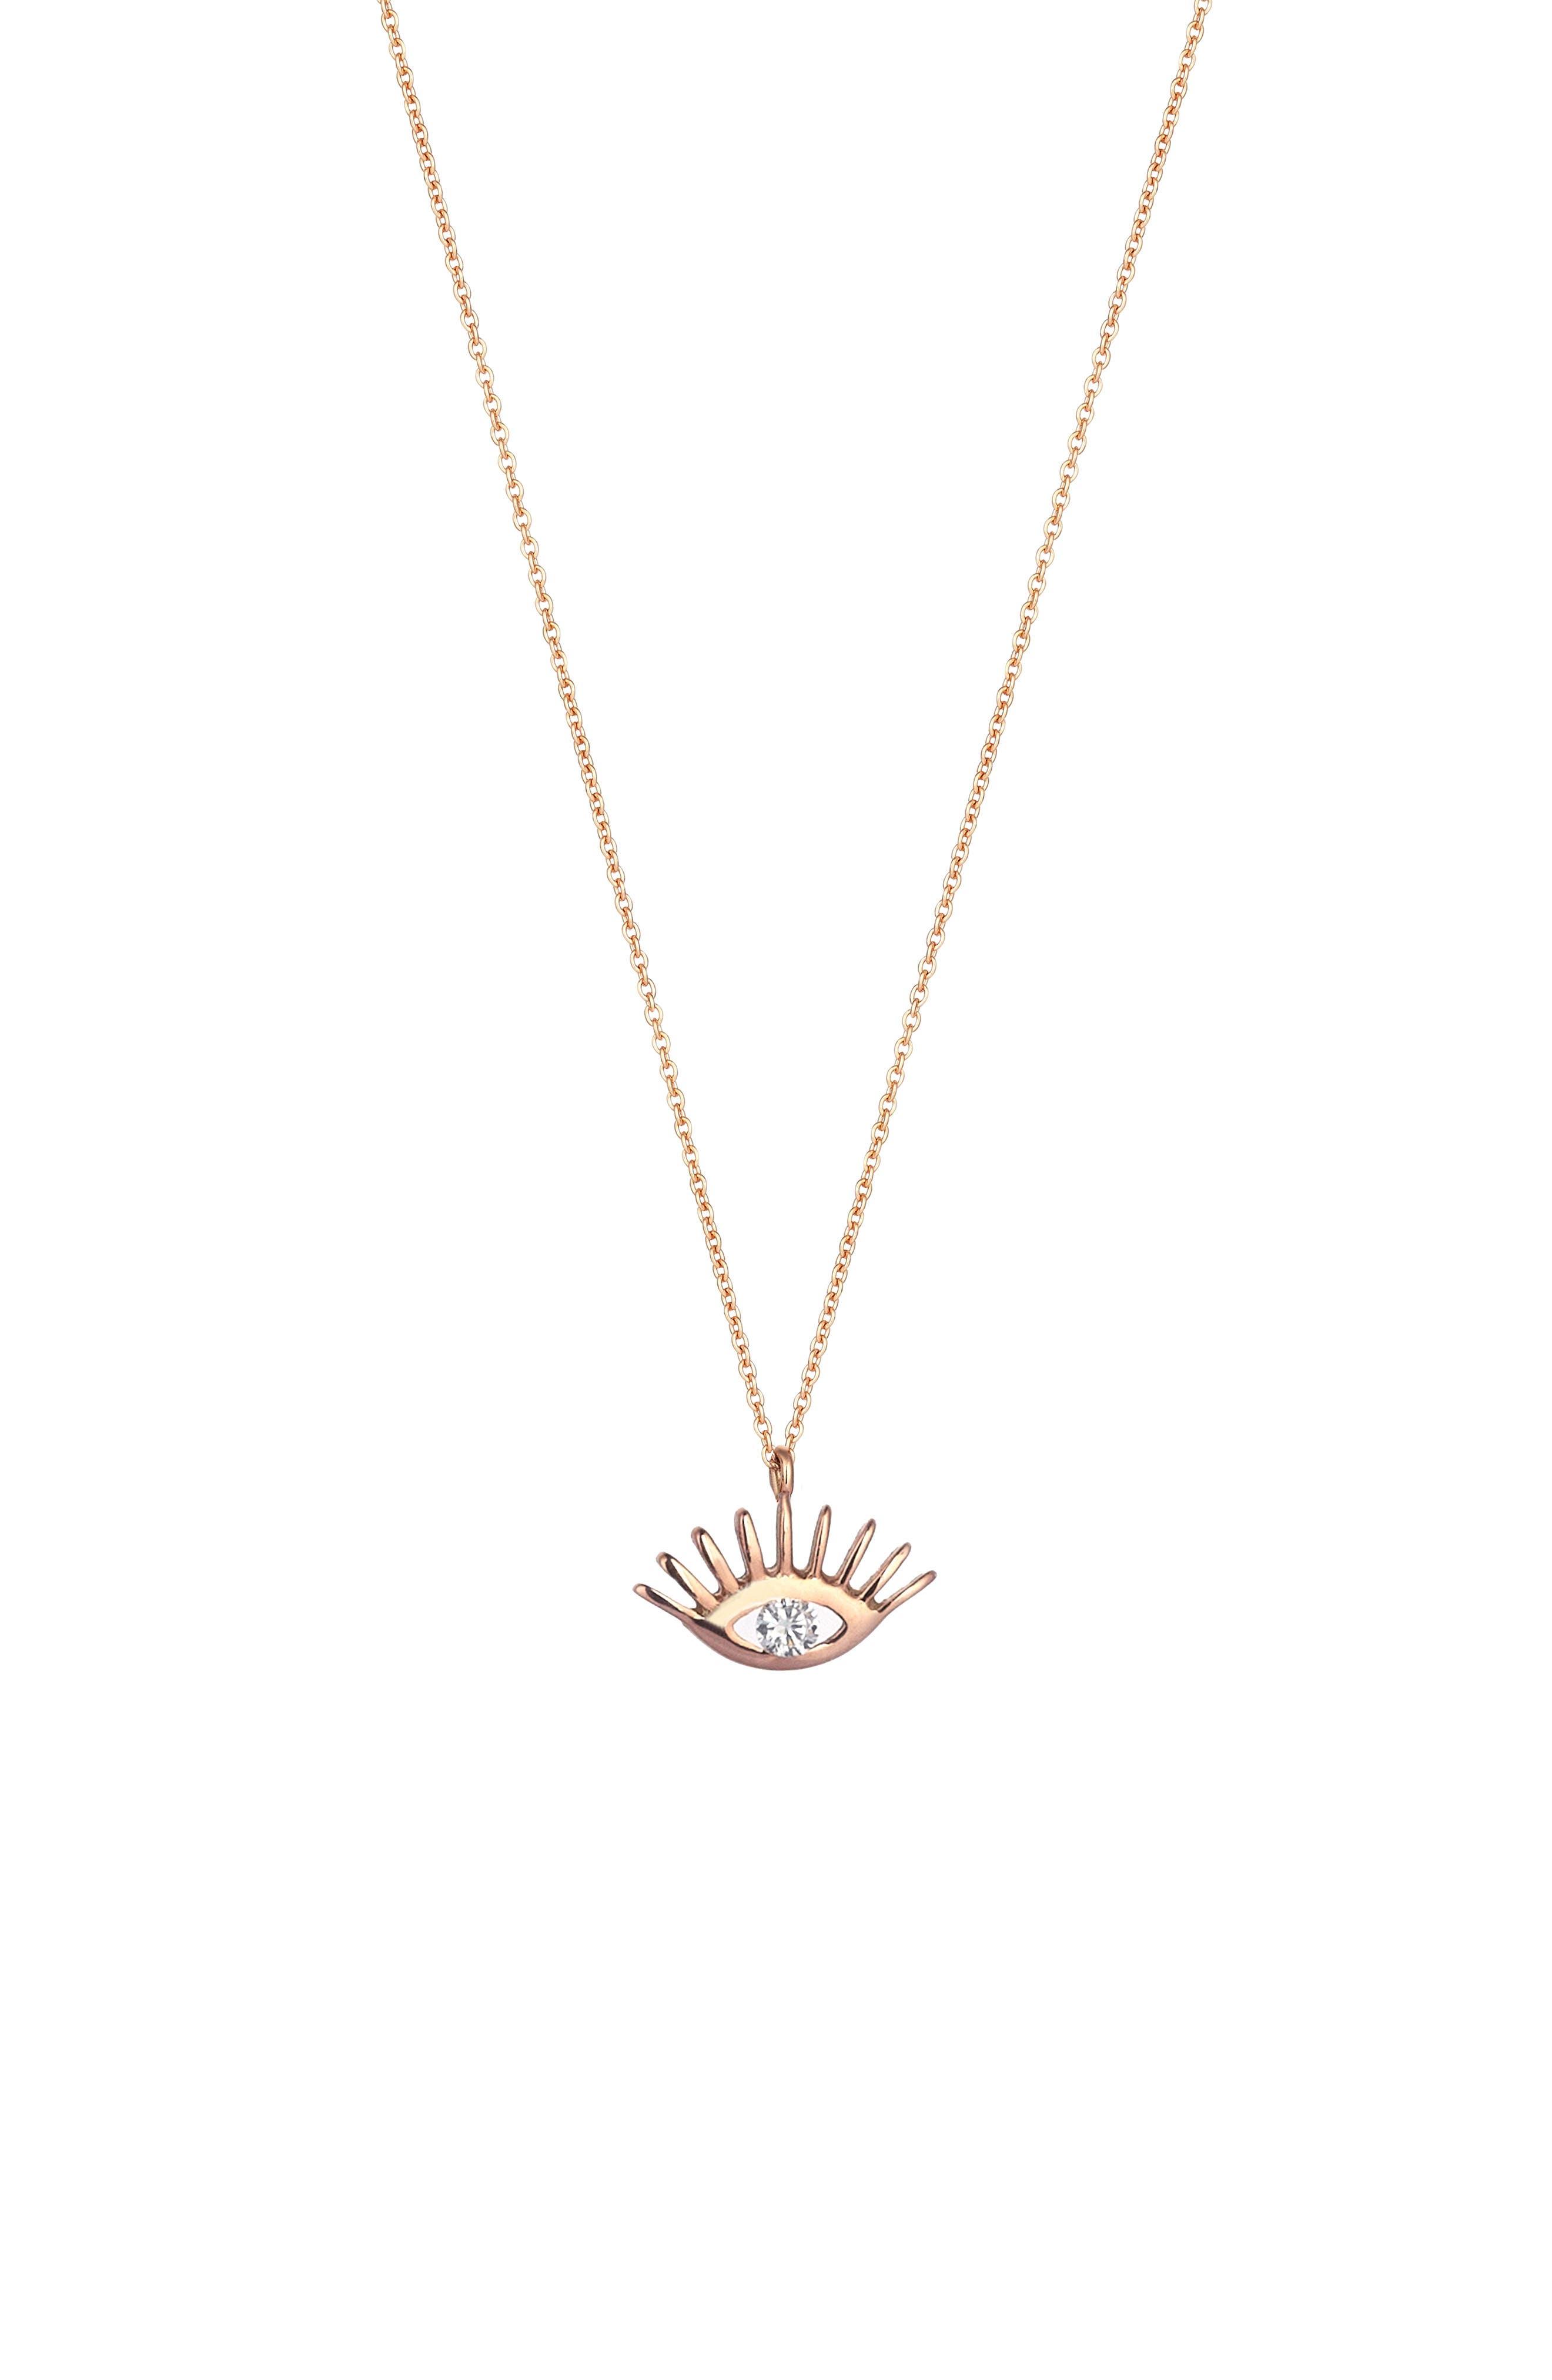 Kismet by Milka Diamond Pendant Necklace